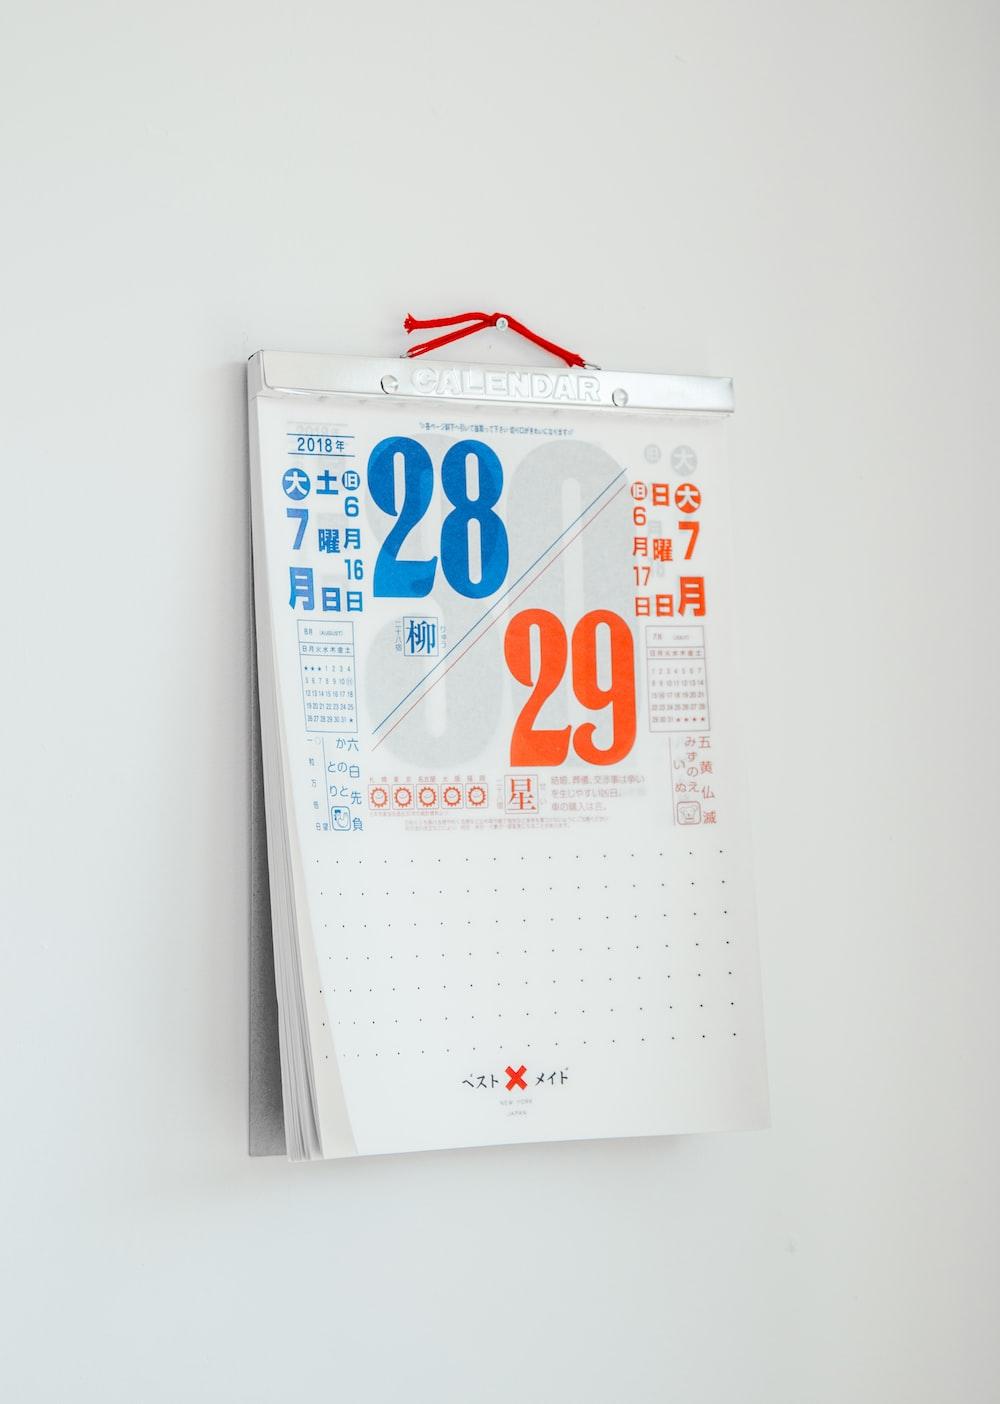 white company calendar on wall